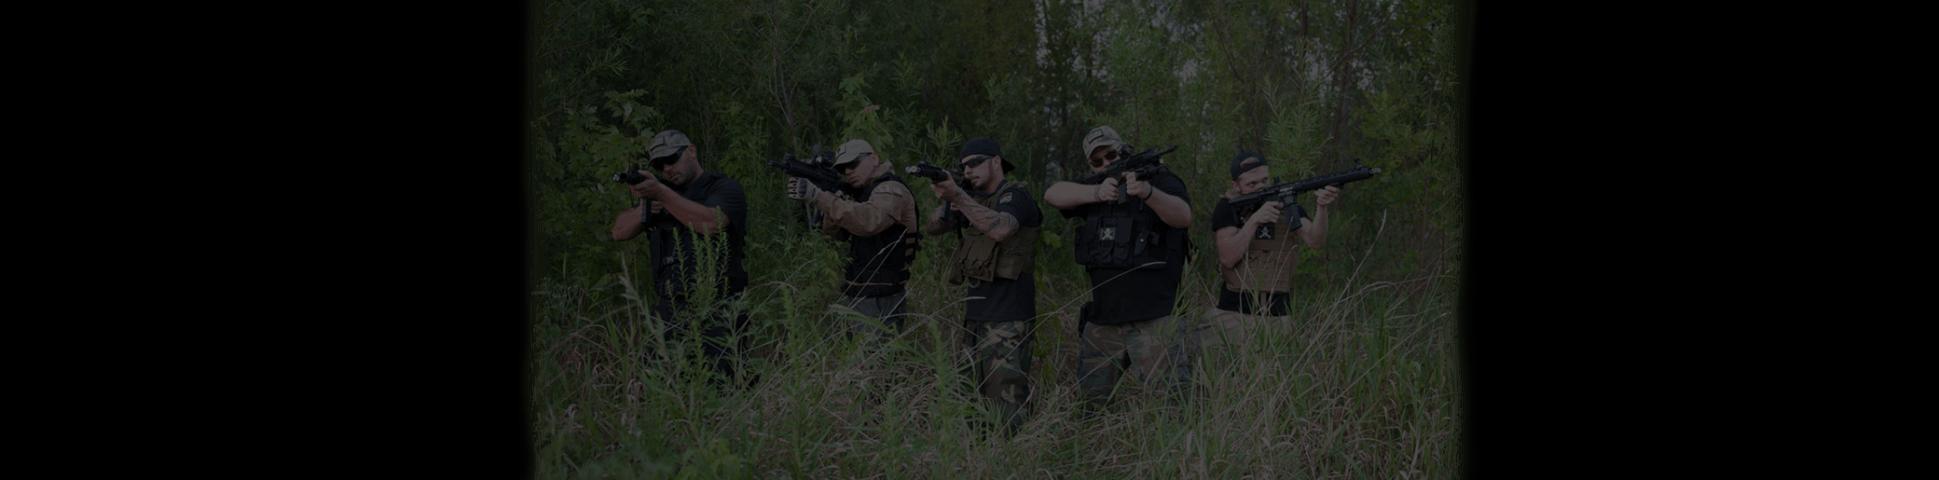 gun-sliders-1a